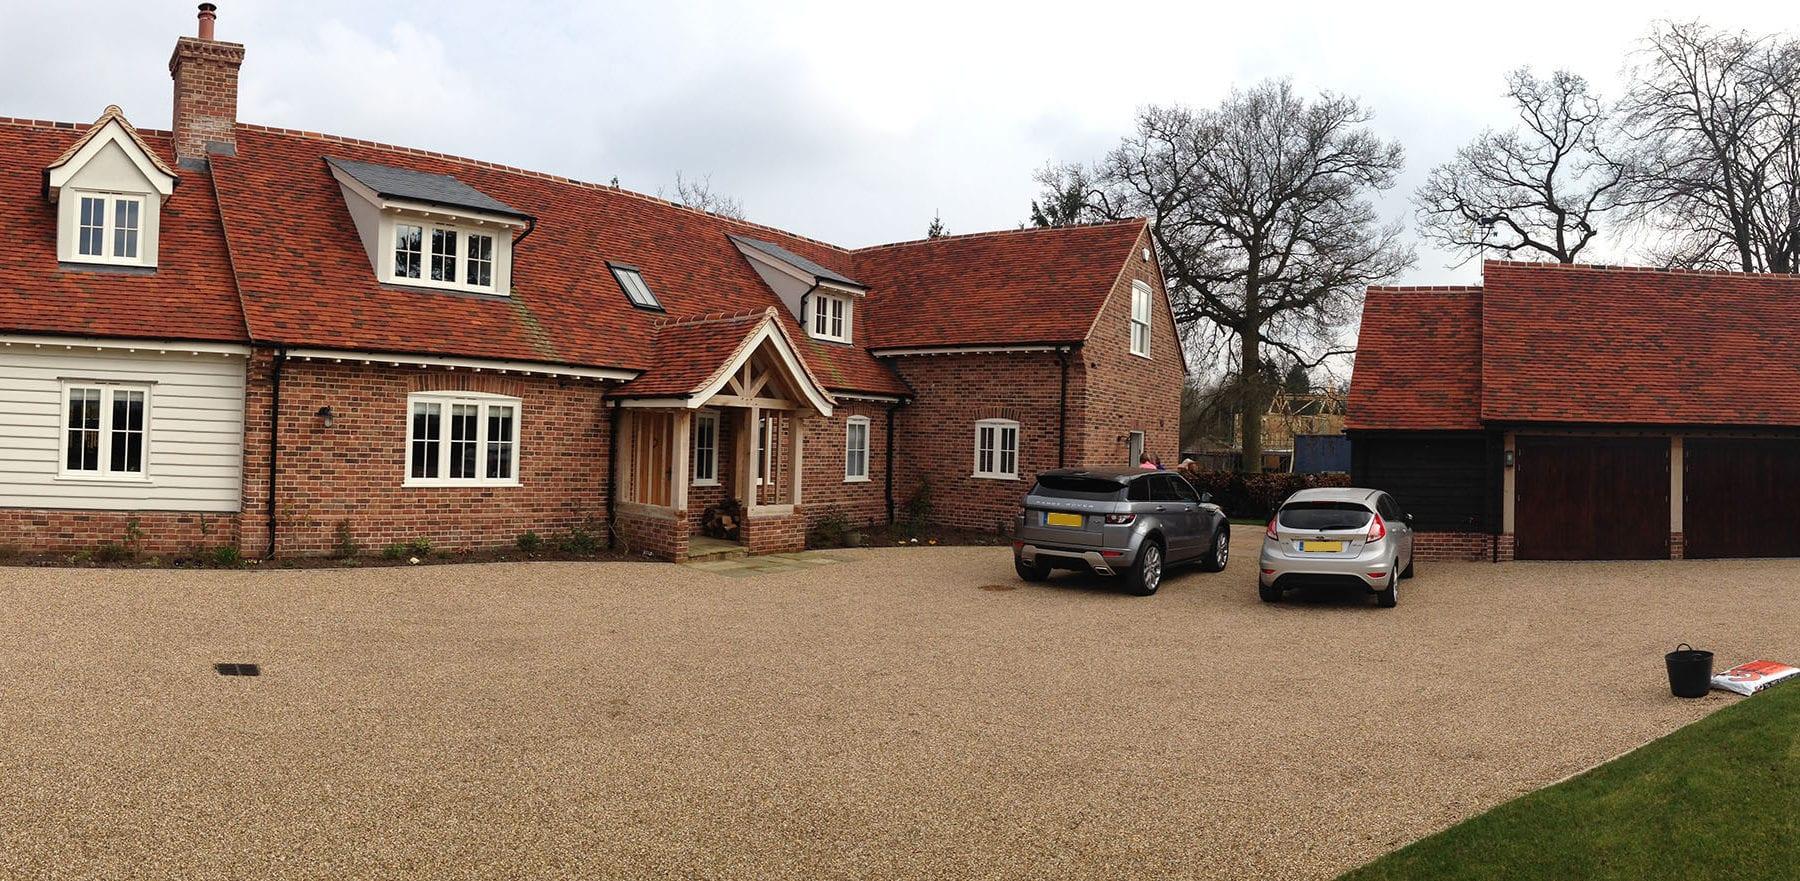 Lifestiles - Handmade Multi Clay Roof Tiles - Takeley, England 2